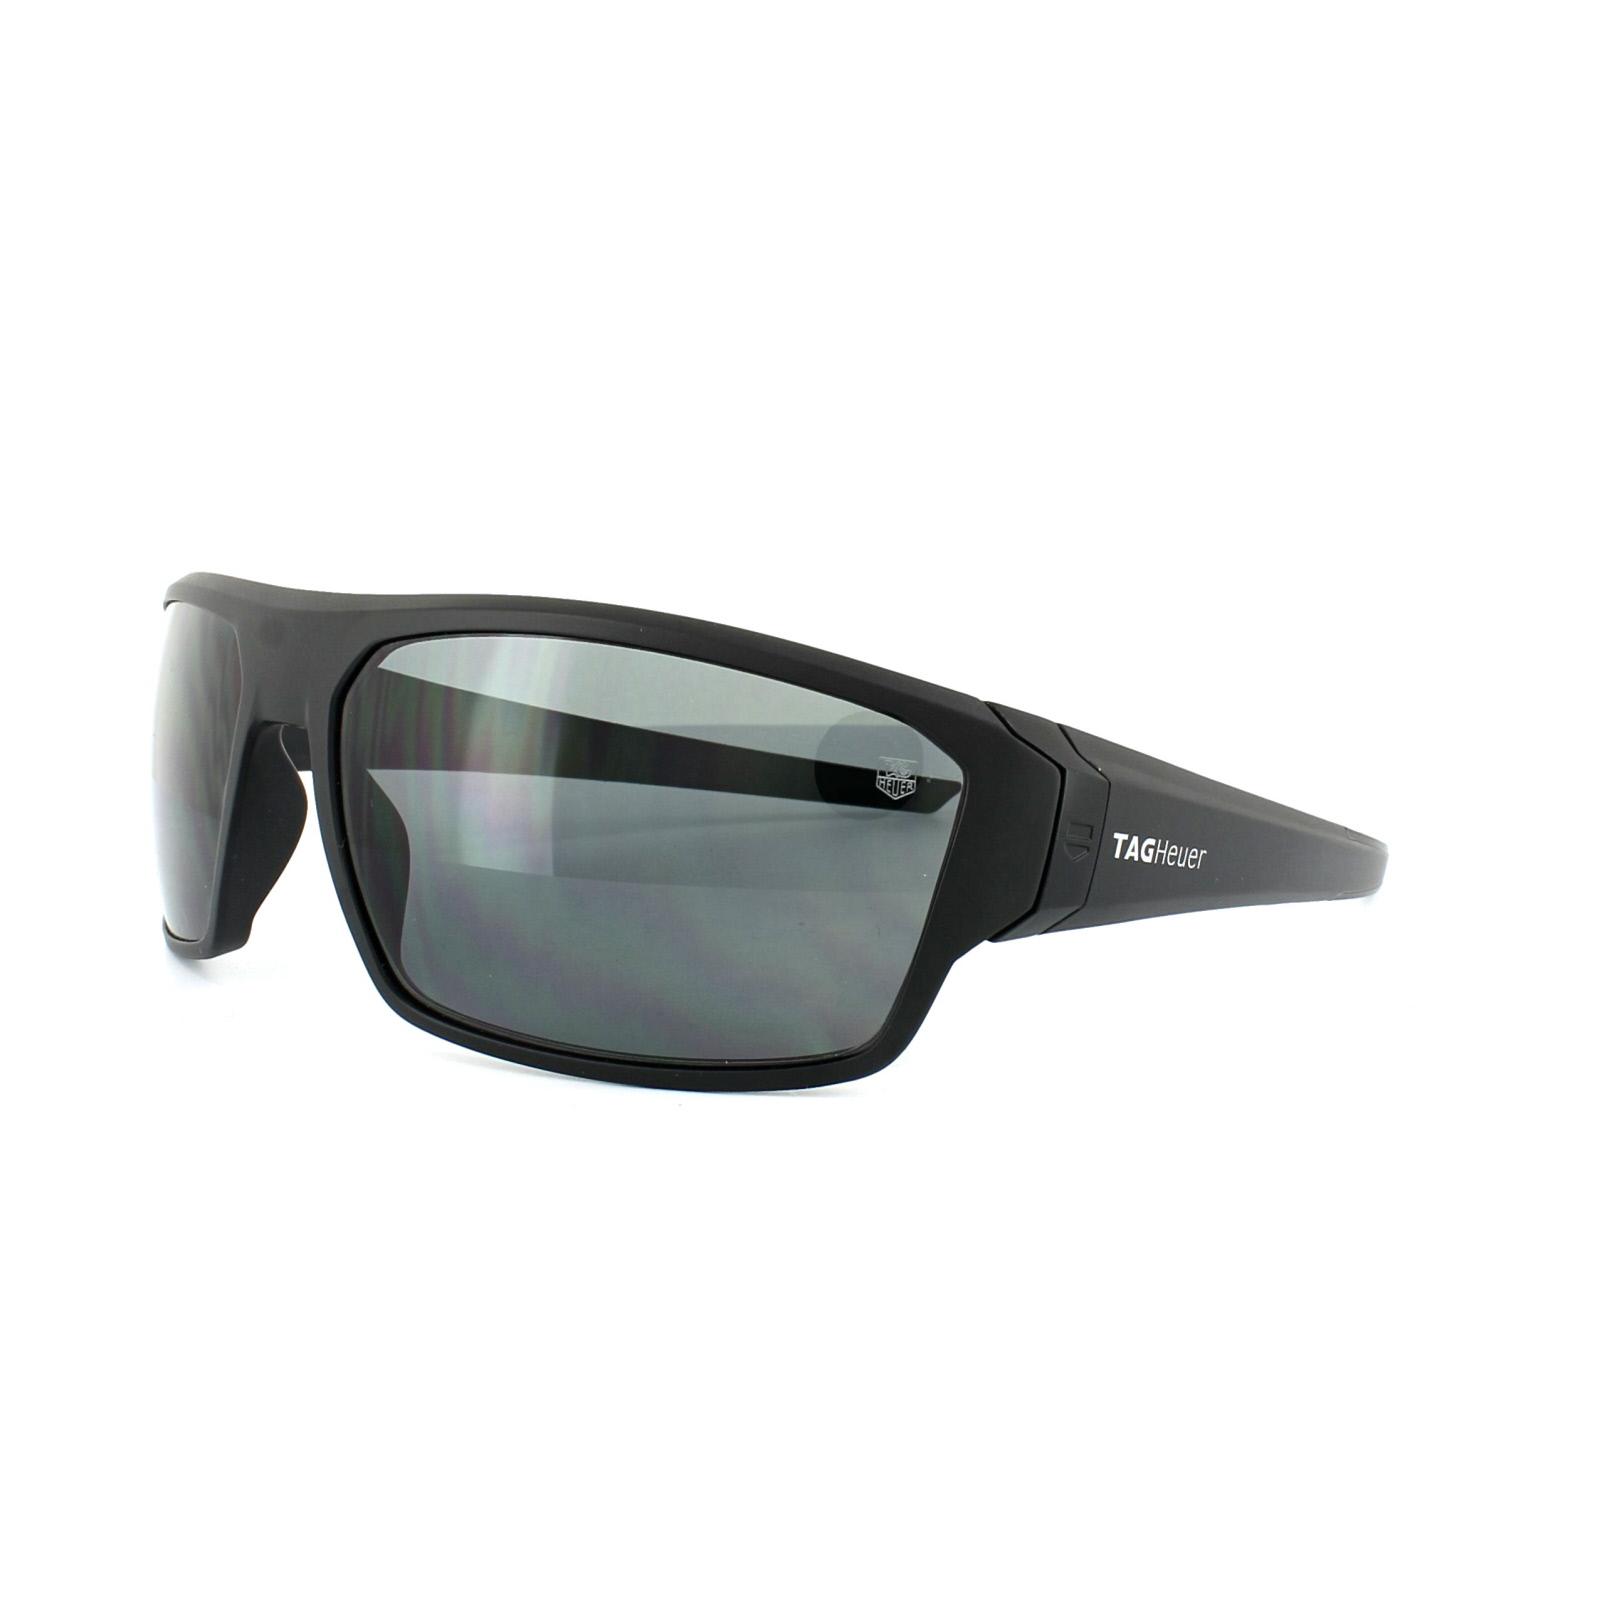 c23e052510 Cheap Tag Heuer Sunglasses - Discounted Sunglasses